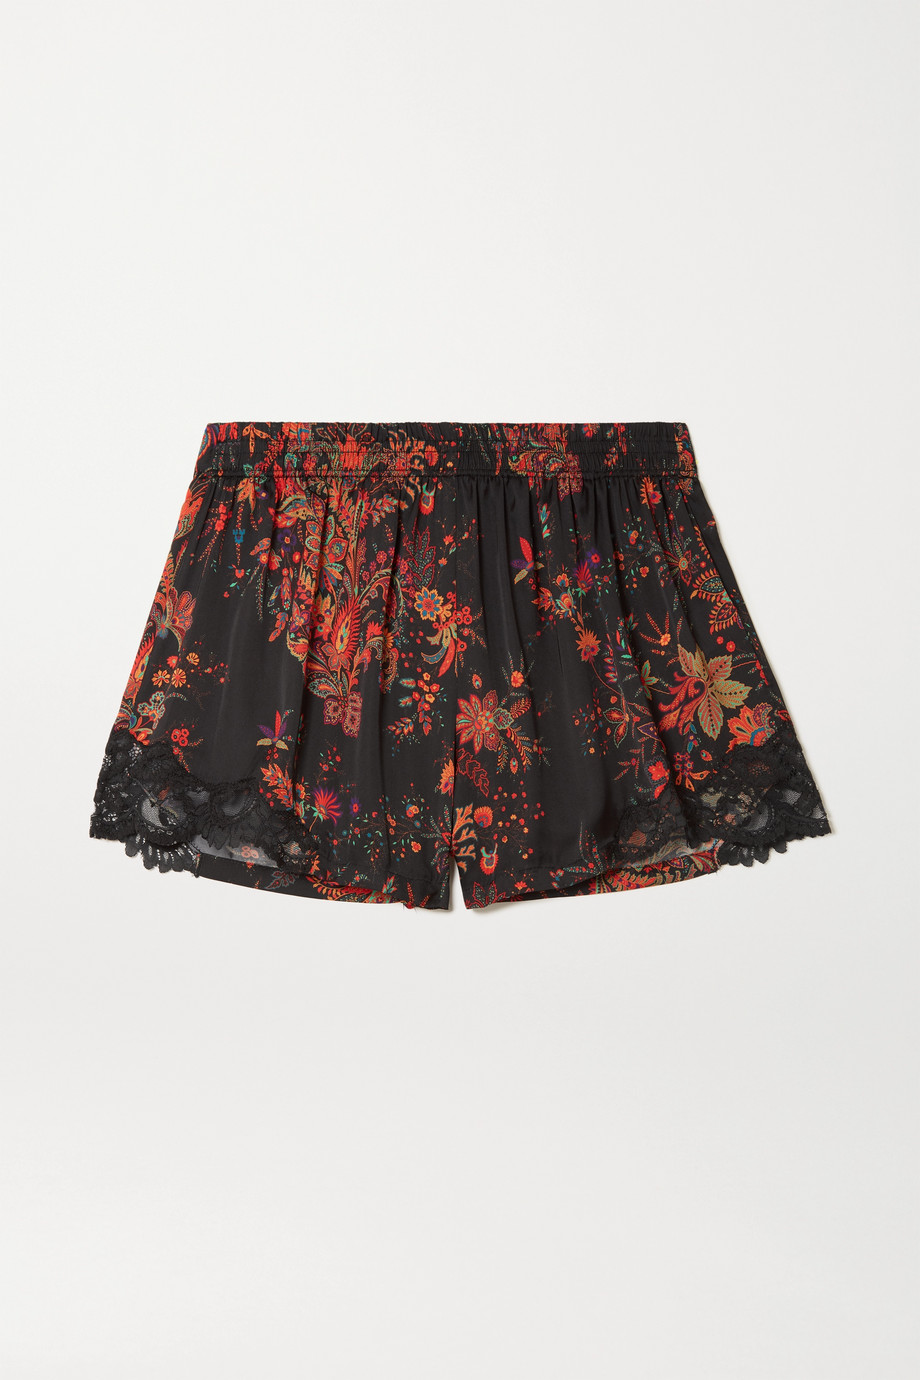 Paco Rabanne Lace-trimmed paisley-print crepe de chine shorts